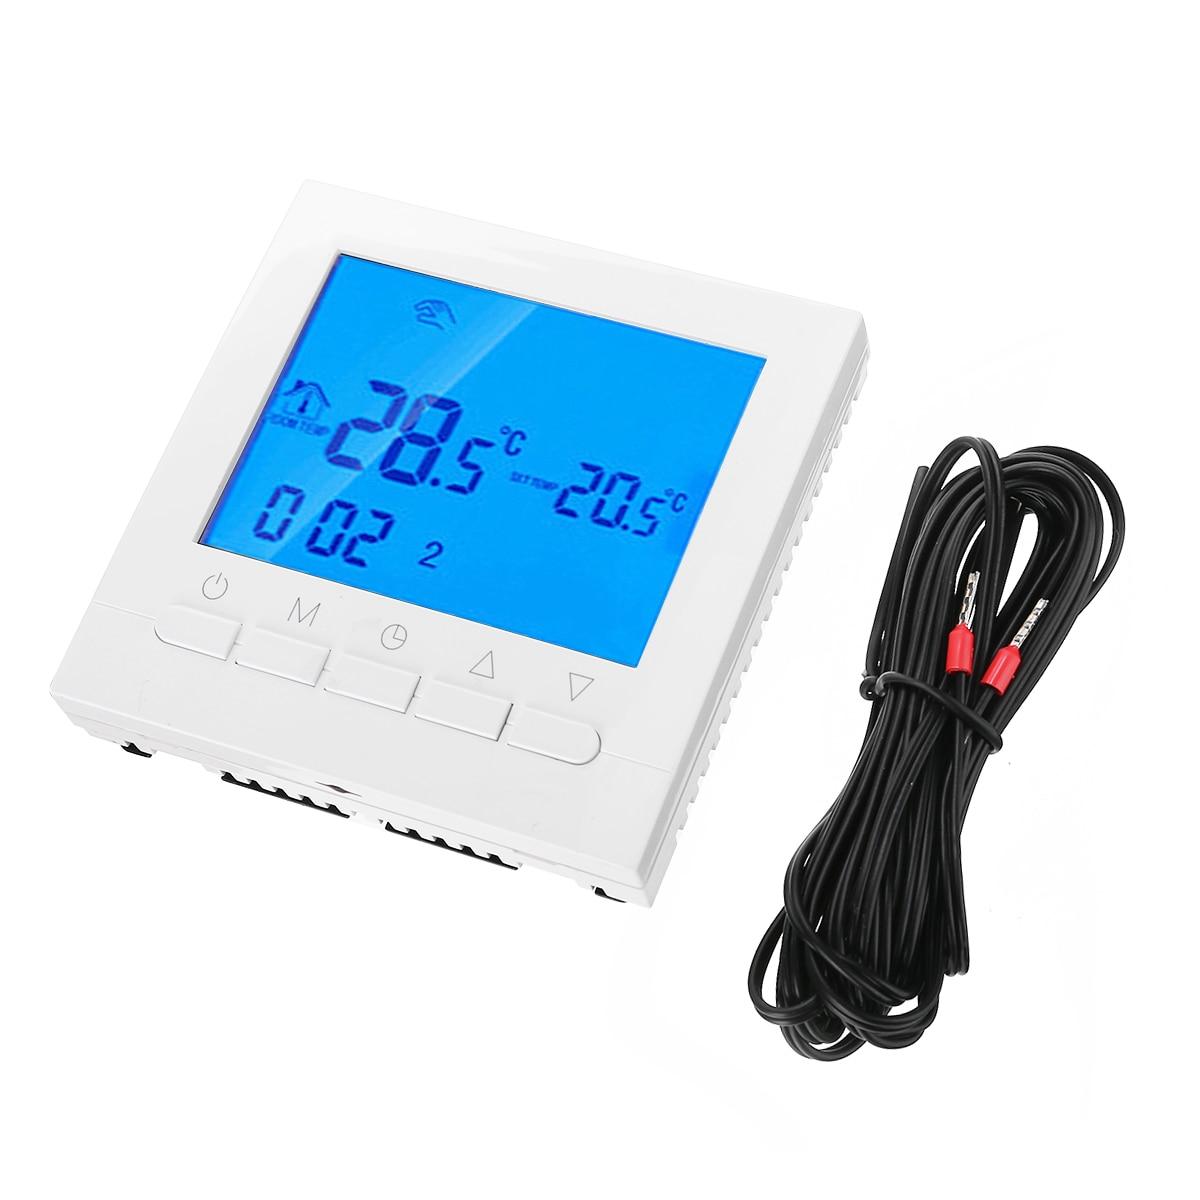 Wifi Smart Digital Thermostat Programmable Wireless LCD App Control AF Digital Thermostat Heating Temperature Regulator